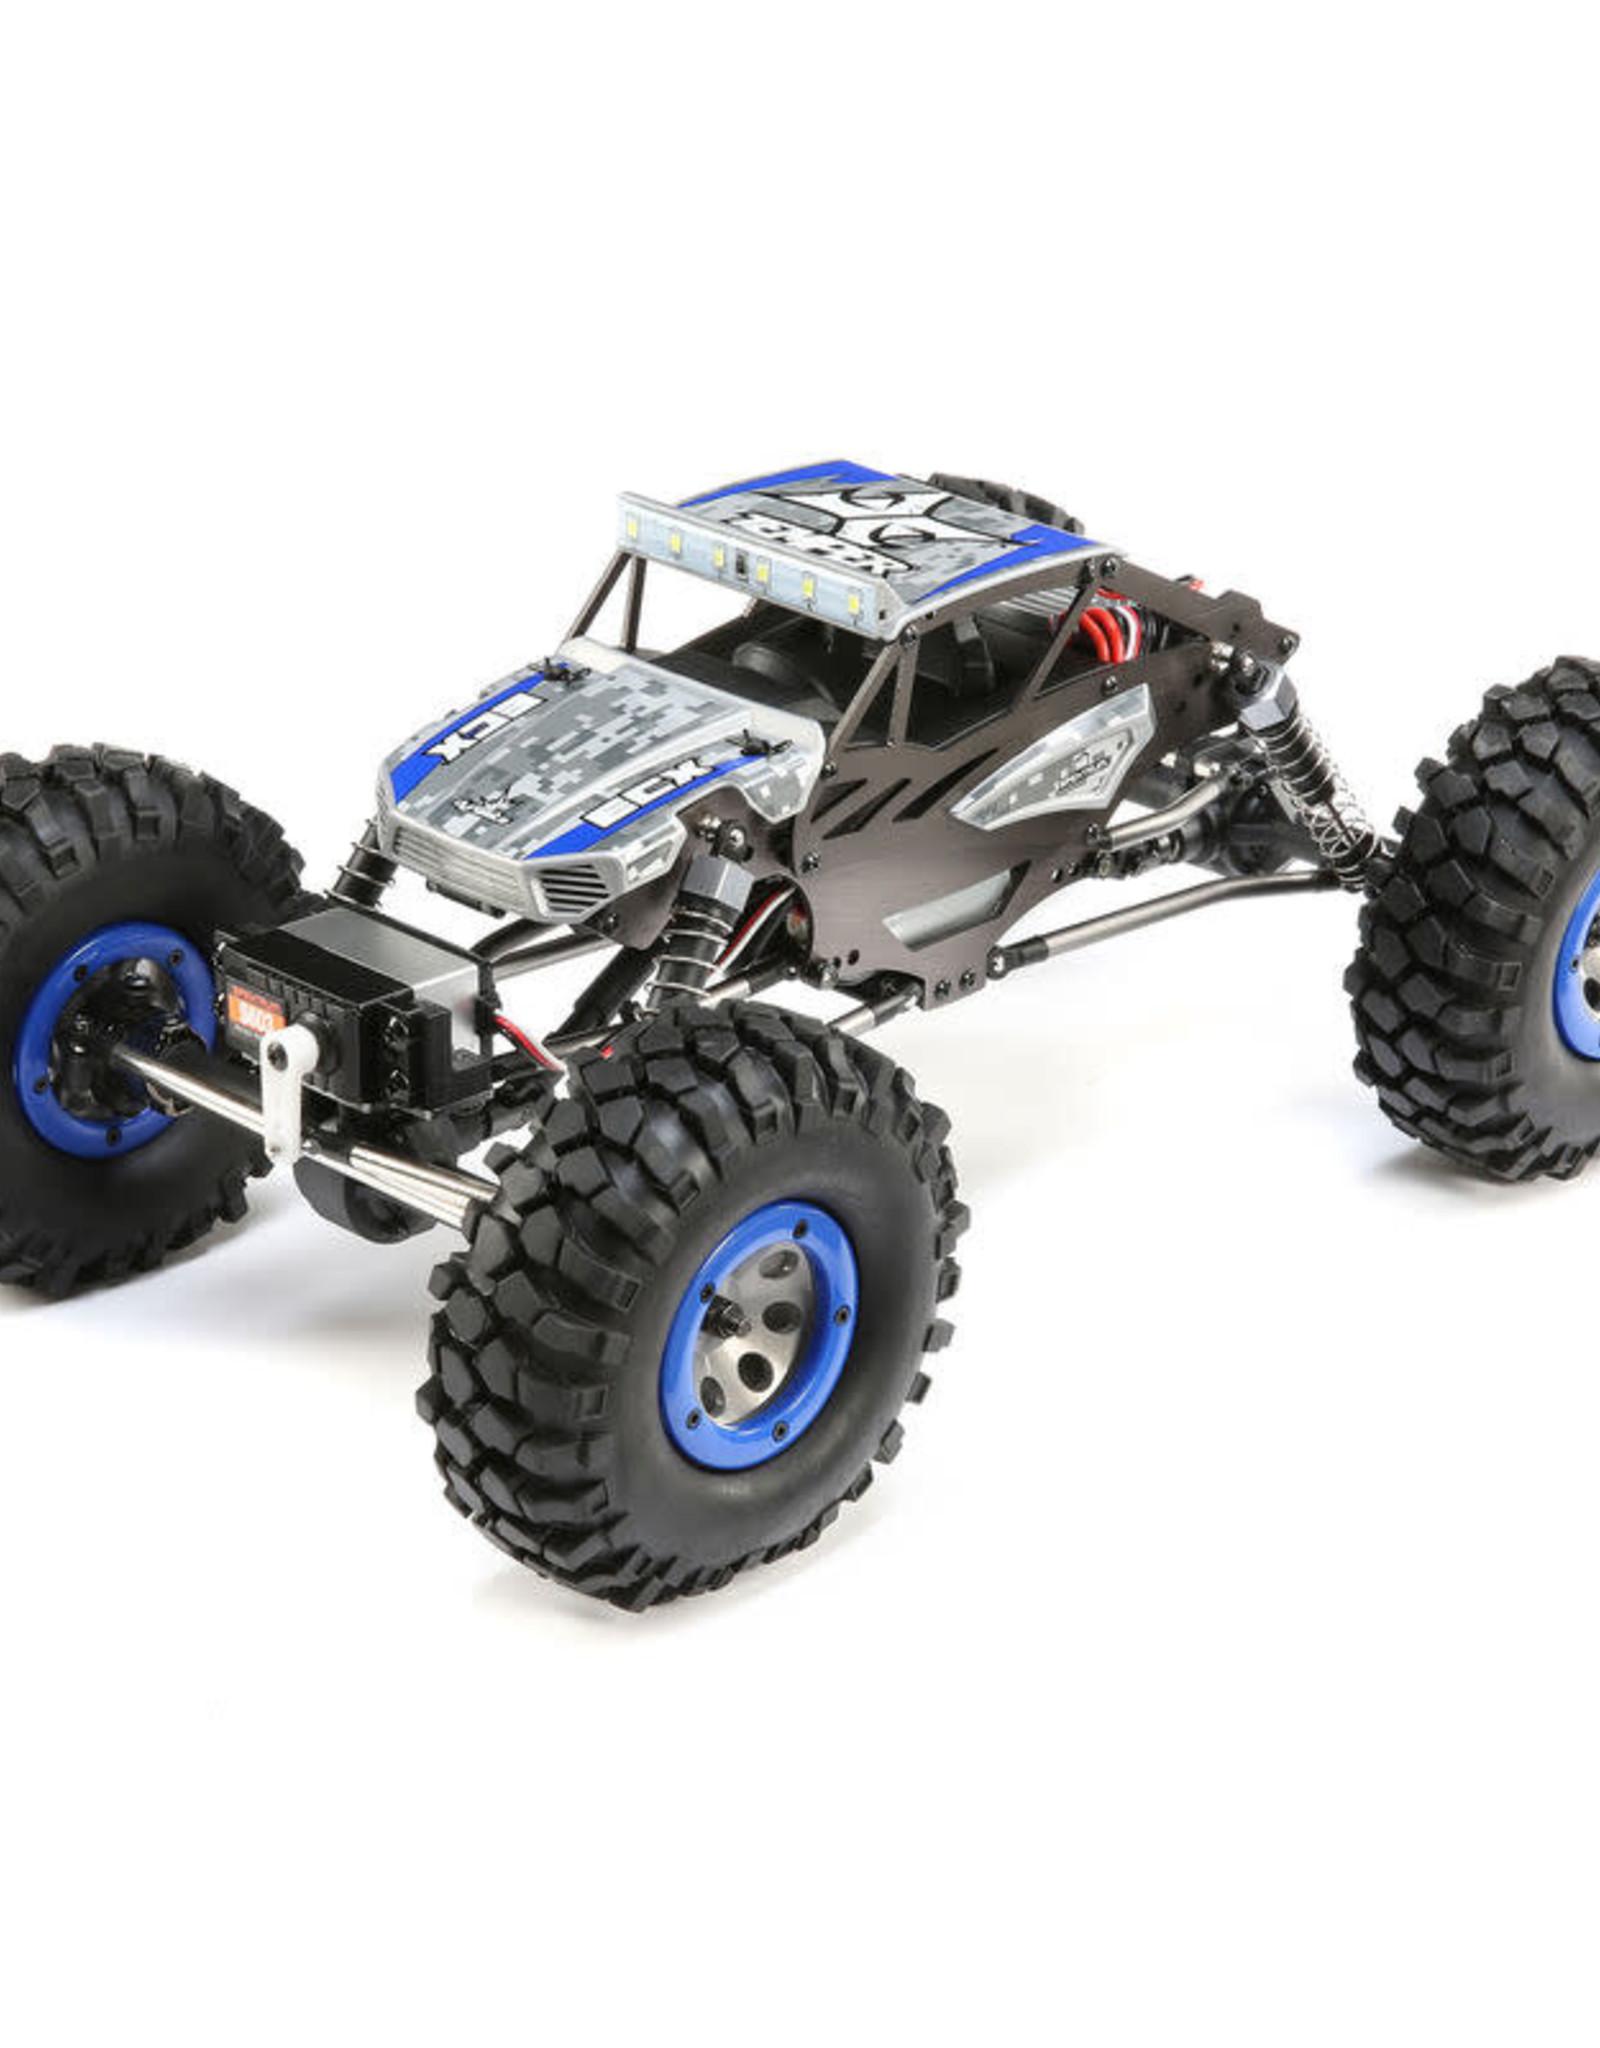 ECX ECX01015T2 1/18 4WD Temper Gen 2, Brushed: Blue RTR